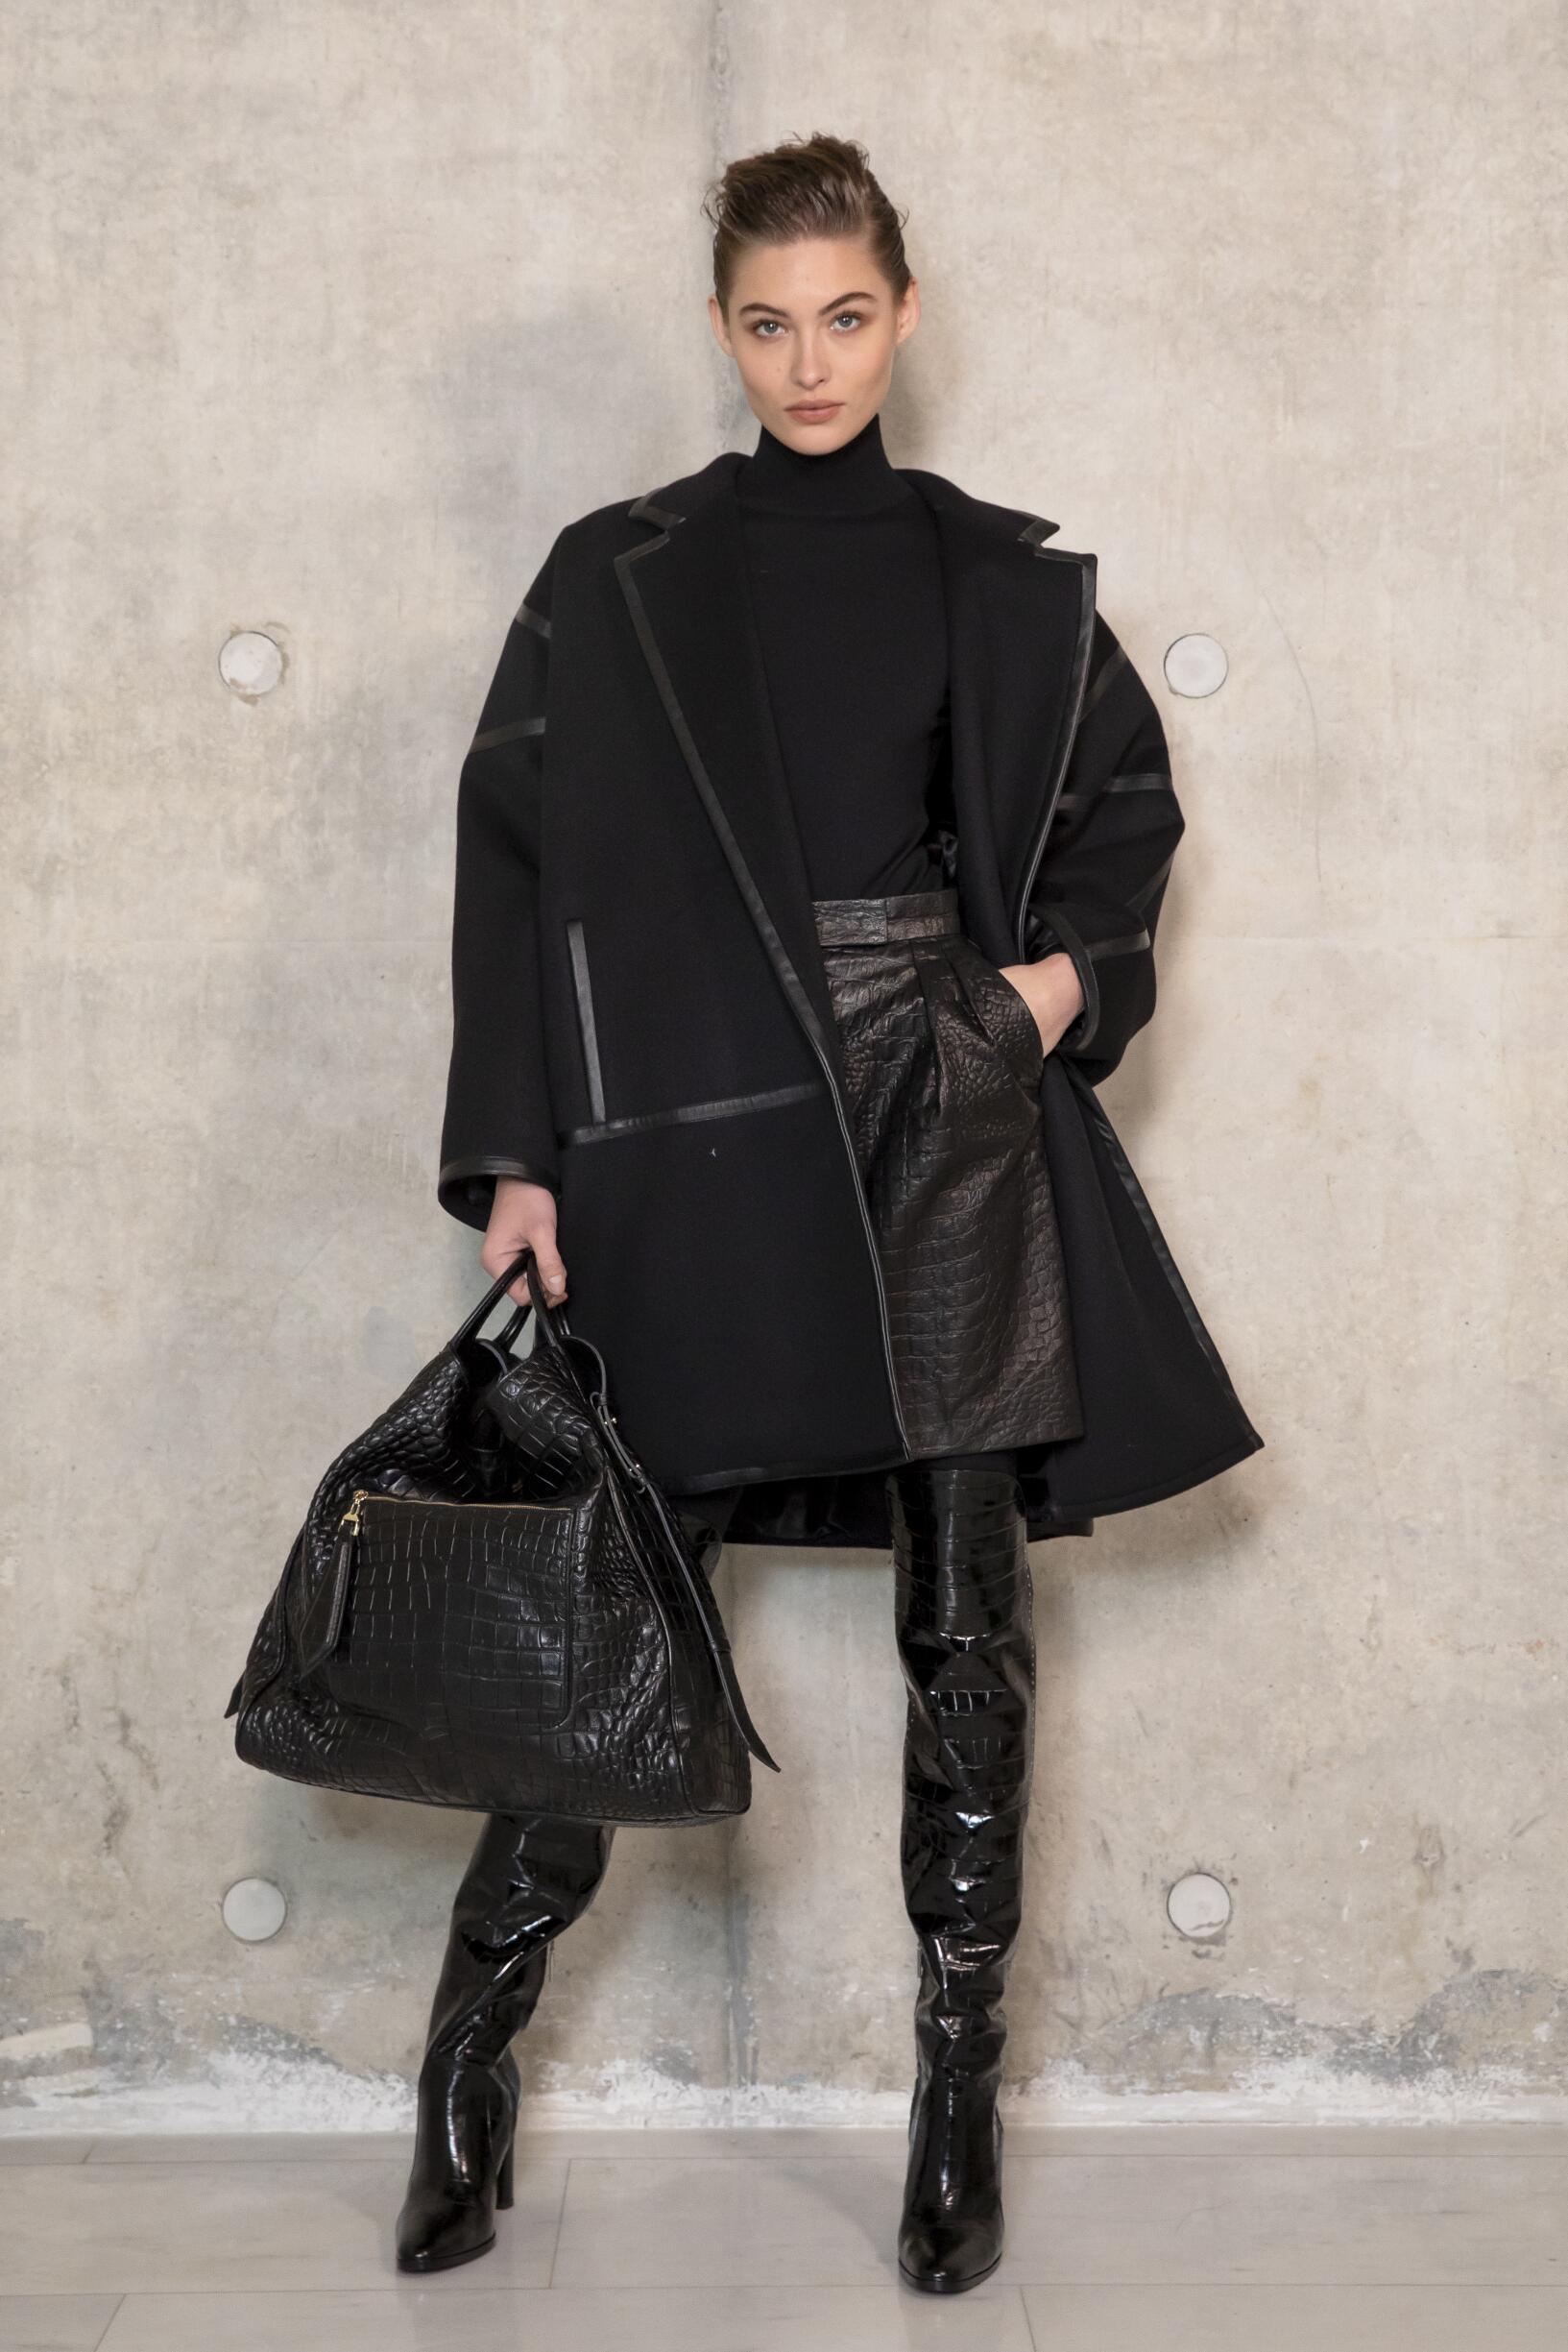 Backstage Max Mara Model 2019 FW